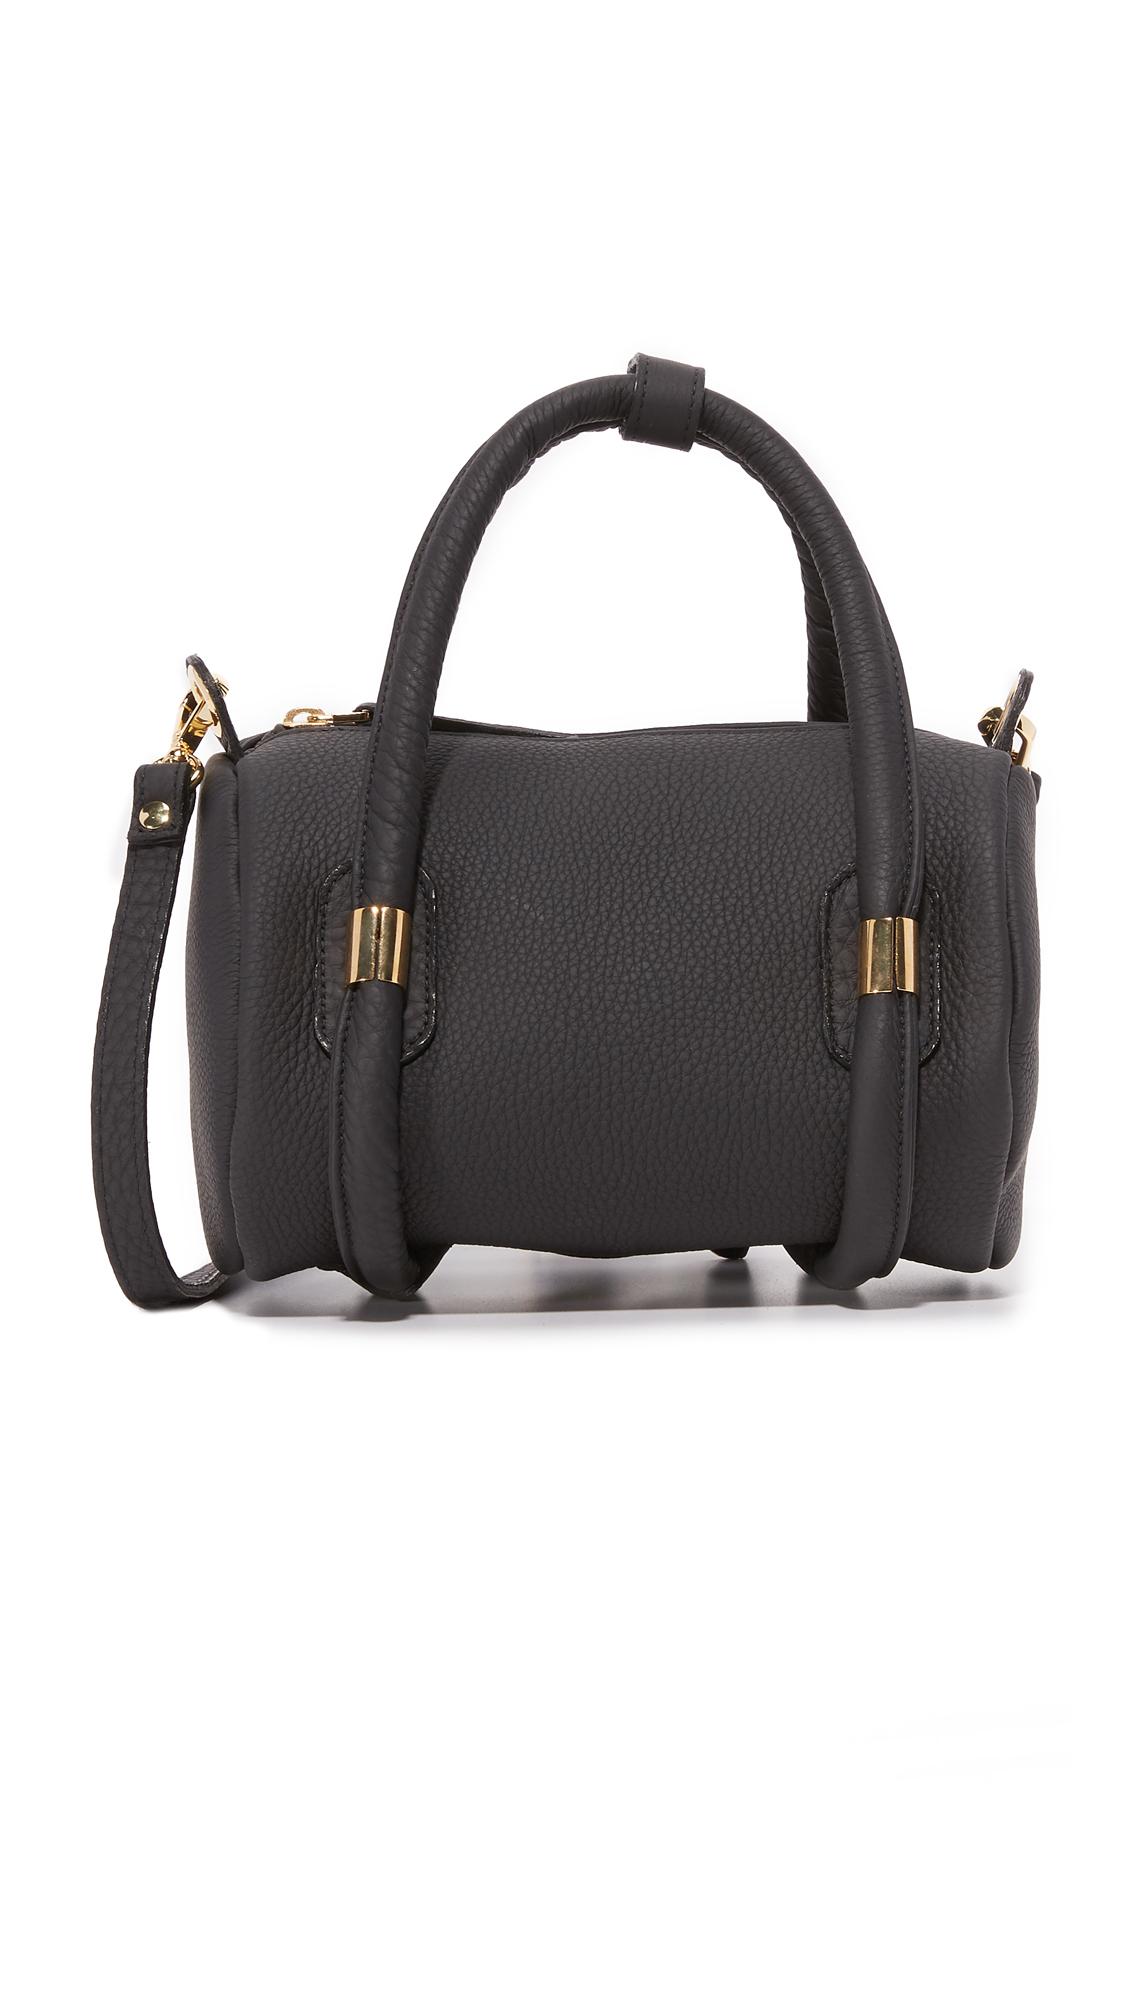 Aandd Mini Duffel Bag - Black at Shopbop